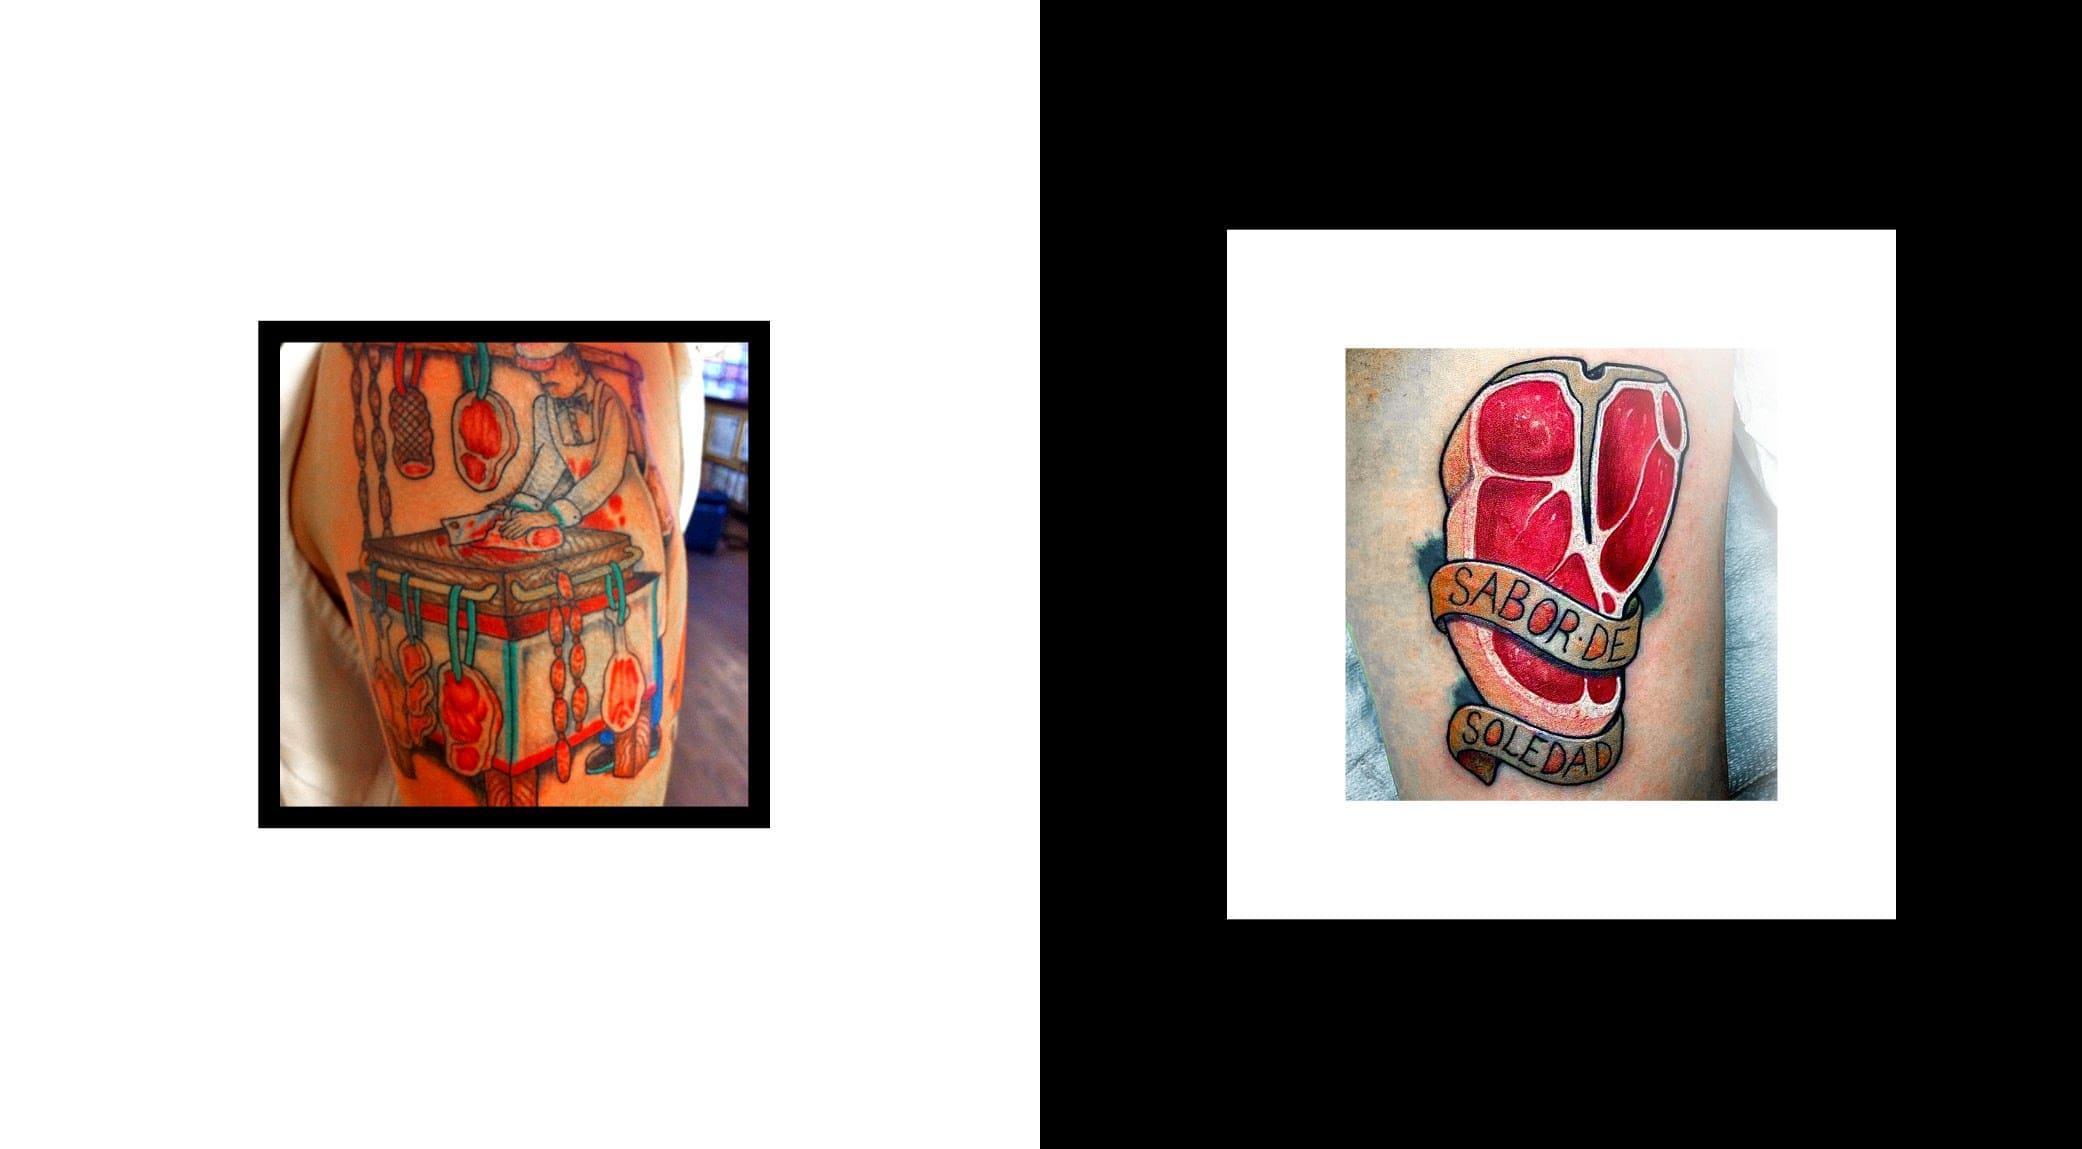 original_003-tattoo-finedininglovers3.jpg